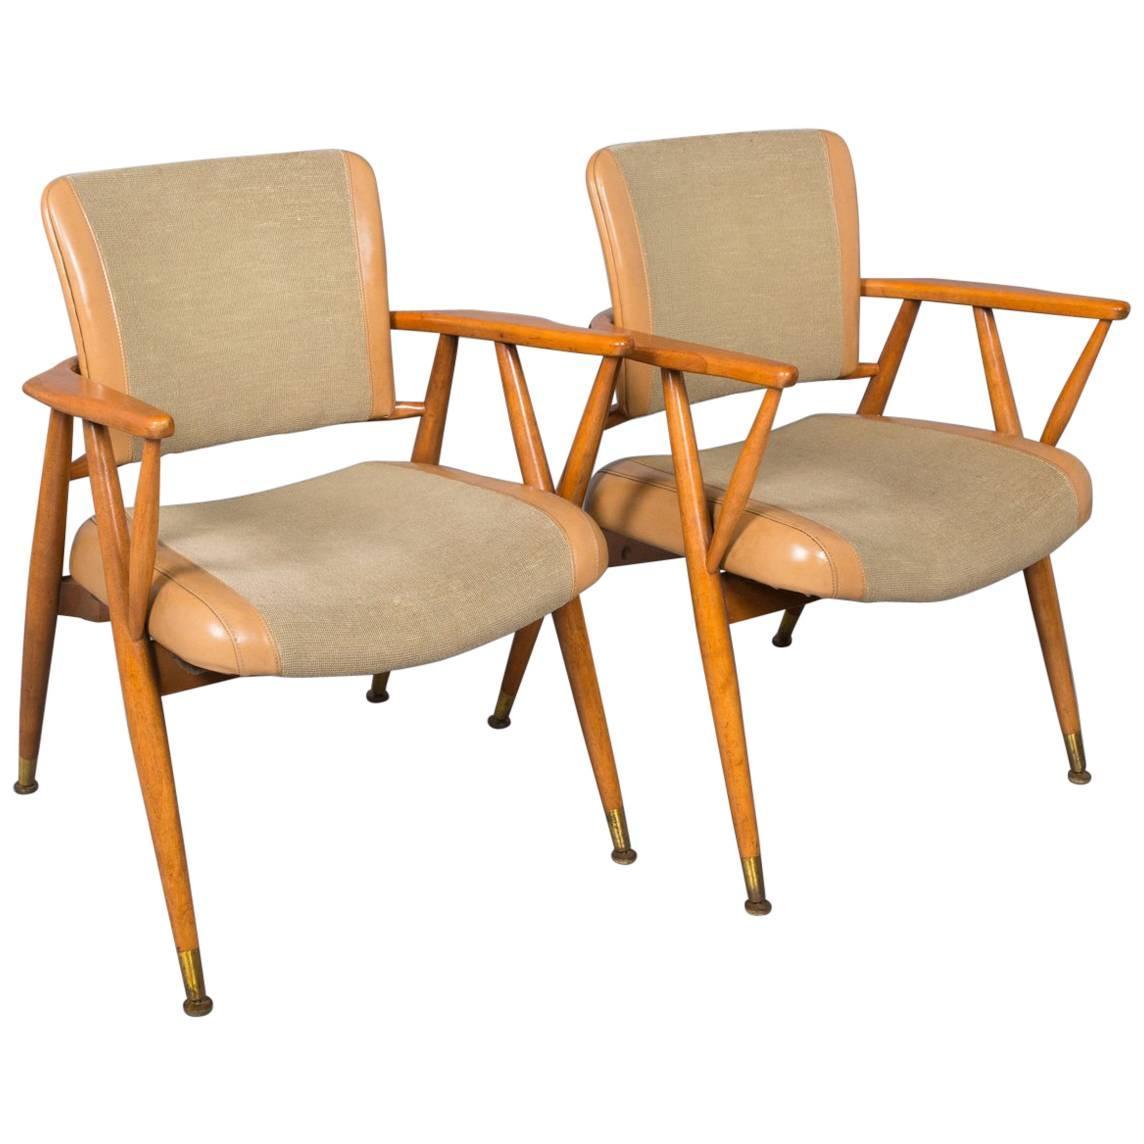 Pair of Midcentury American Armchairs